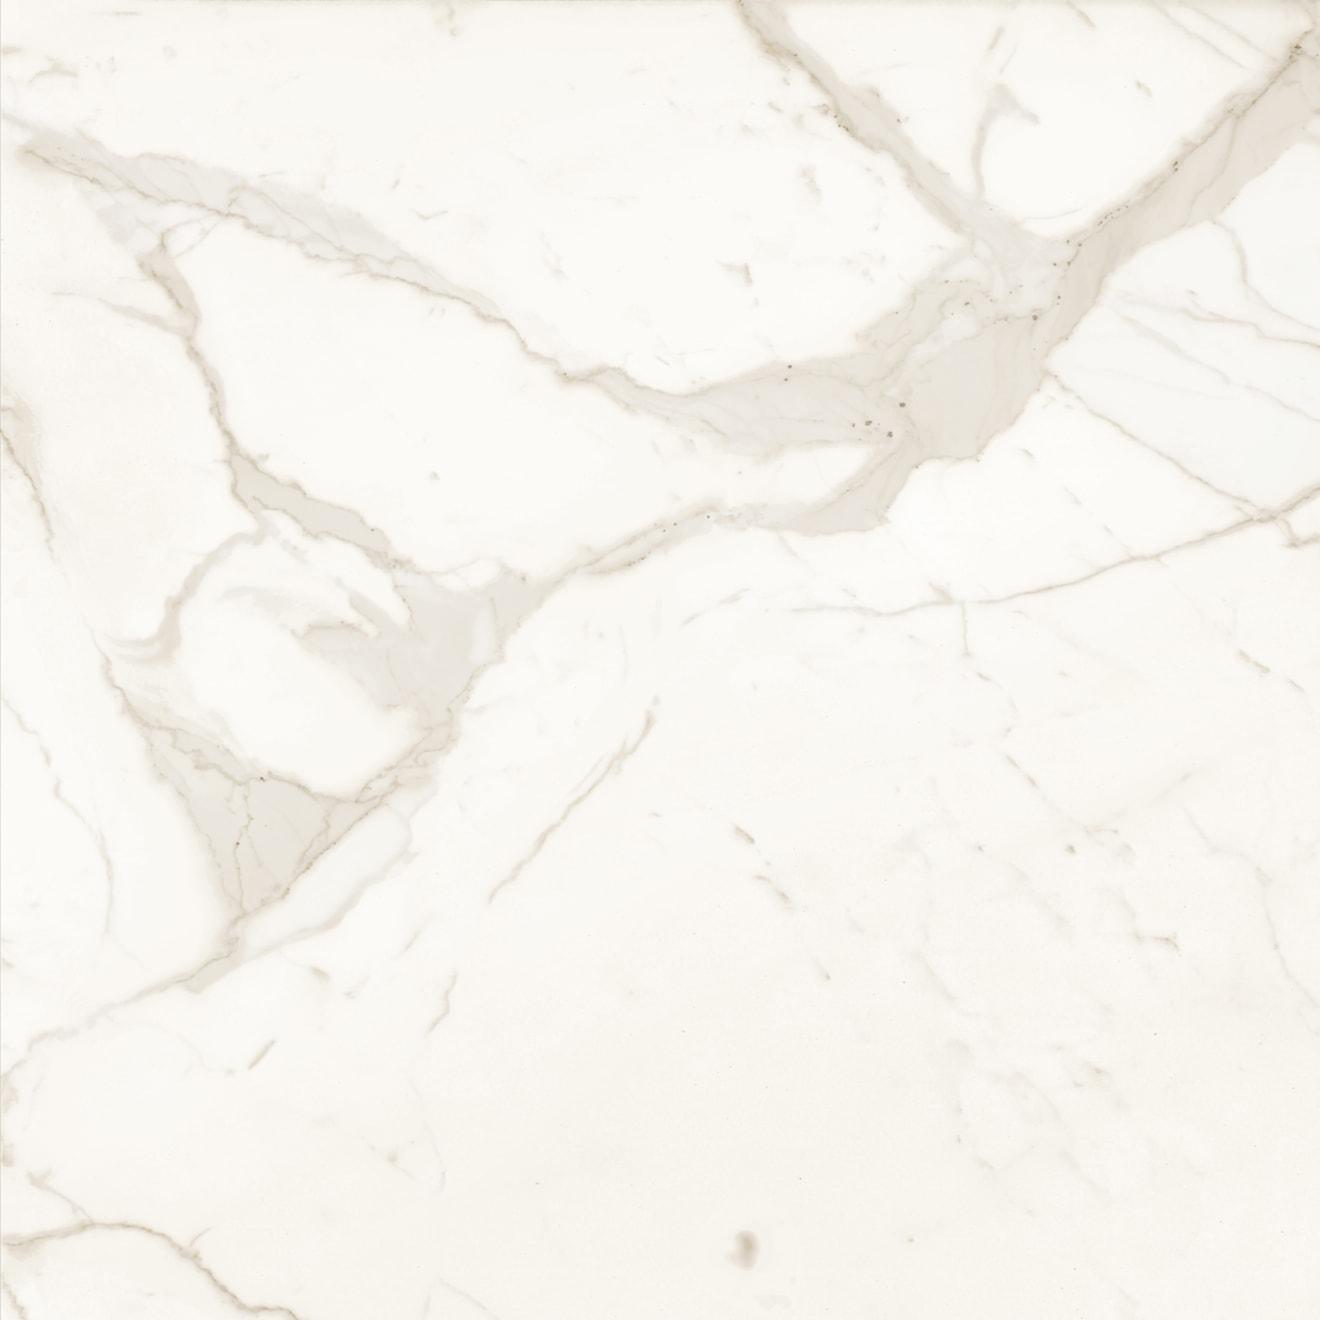 Magnifica 30 X 30 Floor Wall Tile In Calacatta Super White Bedrosians Tile Stone